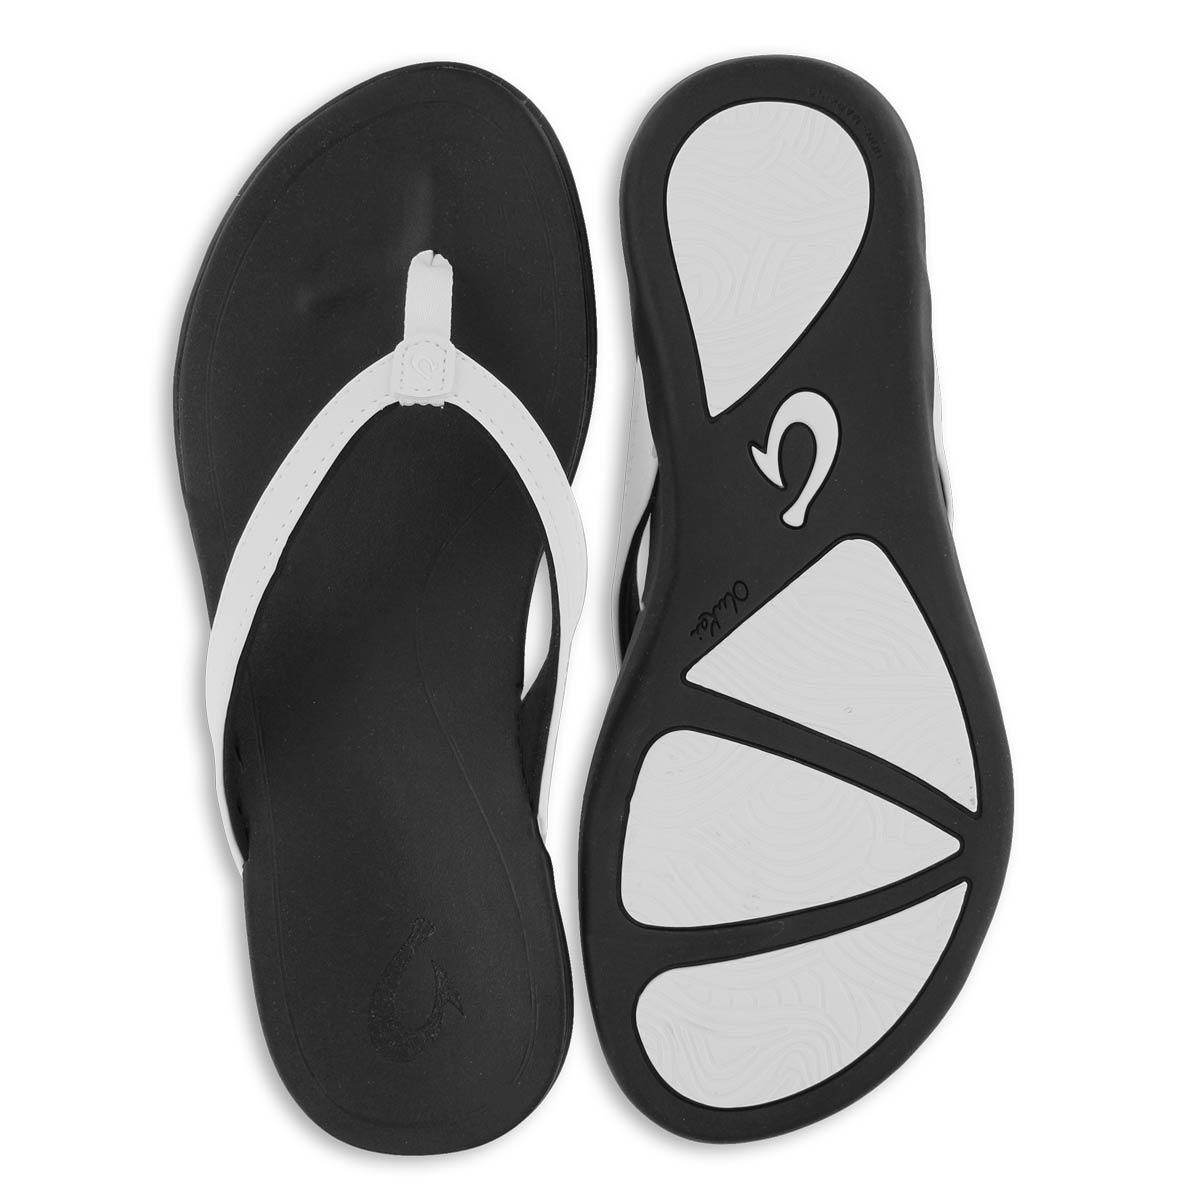 Lds Ho'Opio white/onyx thong sandal